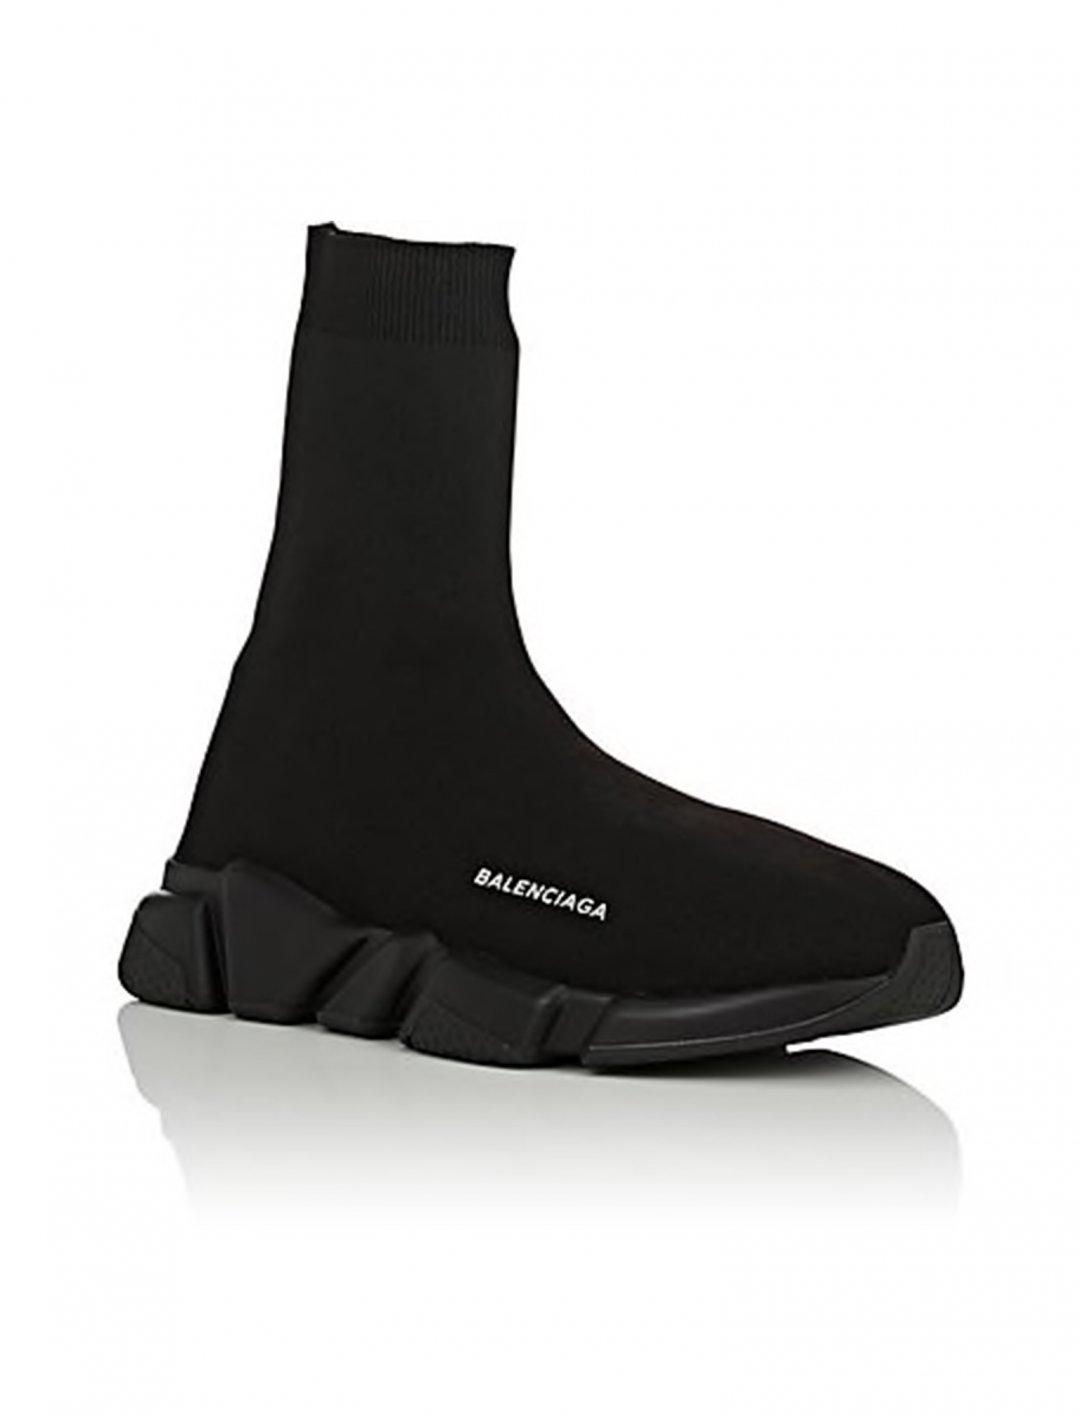 balenciaga sock sneakers white discount